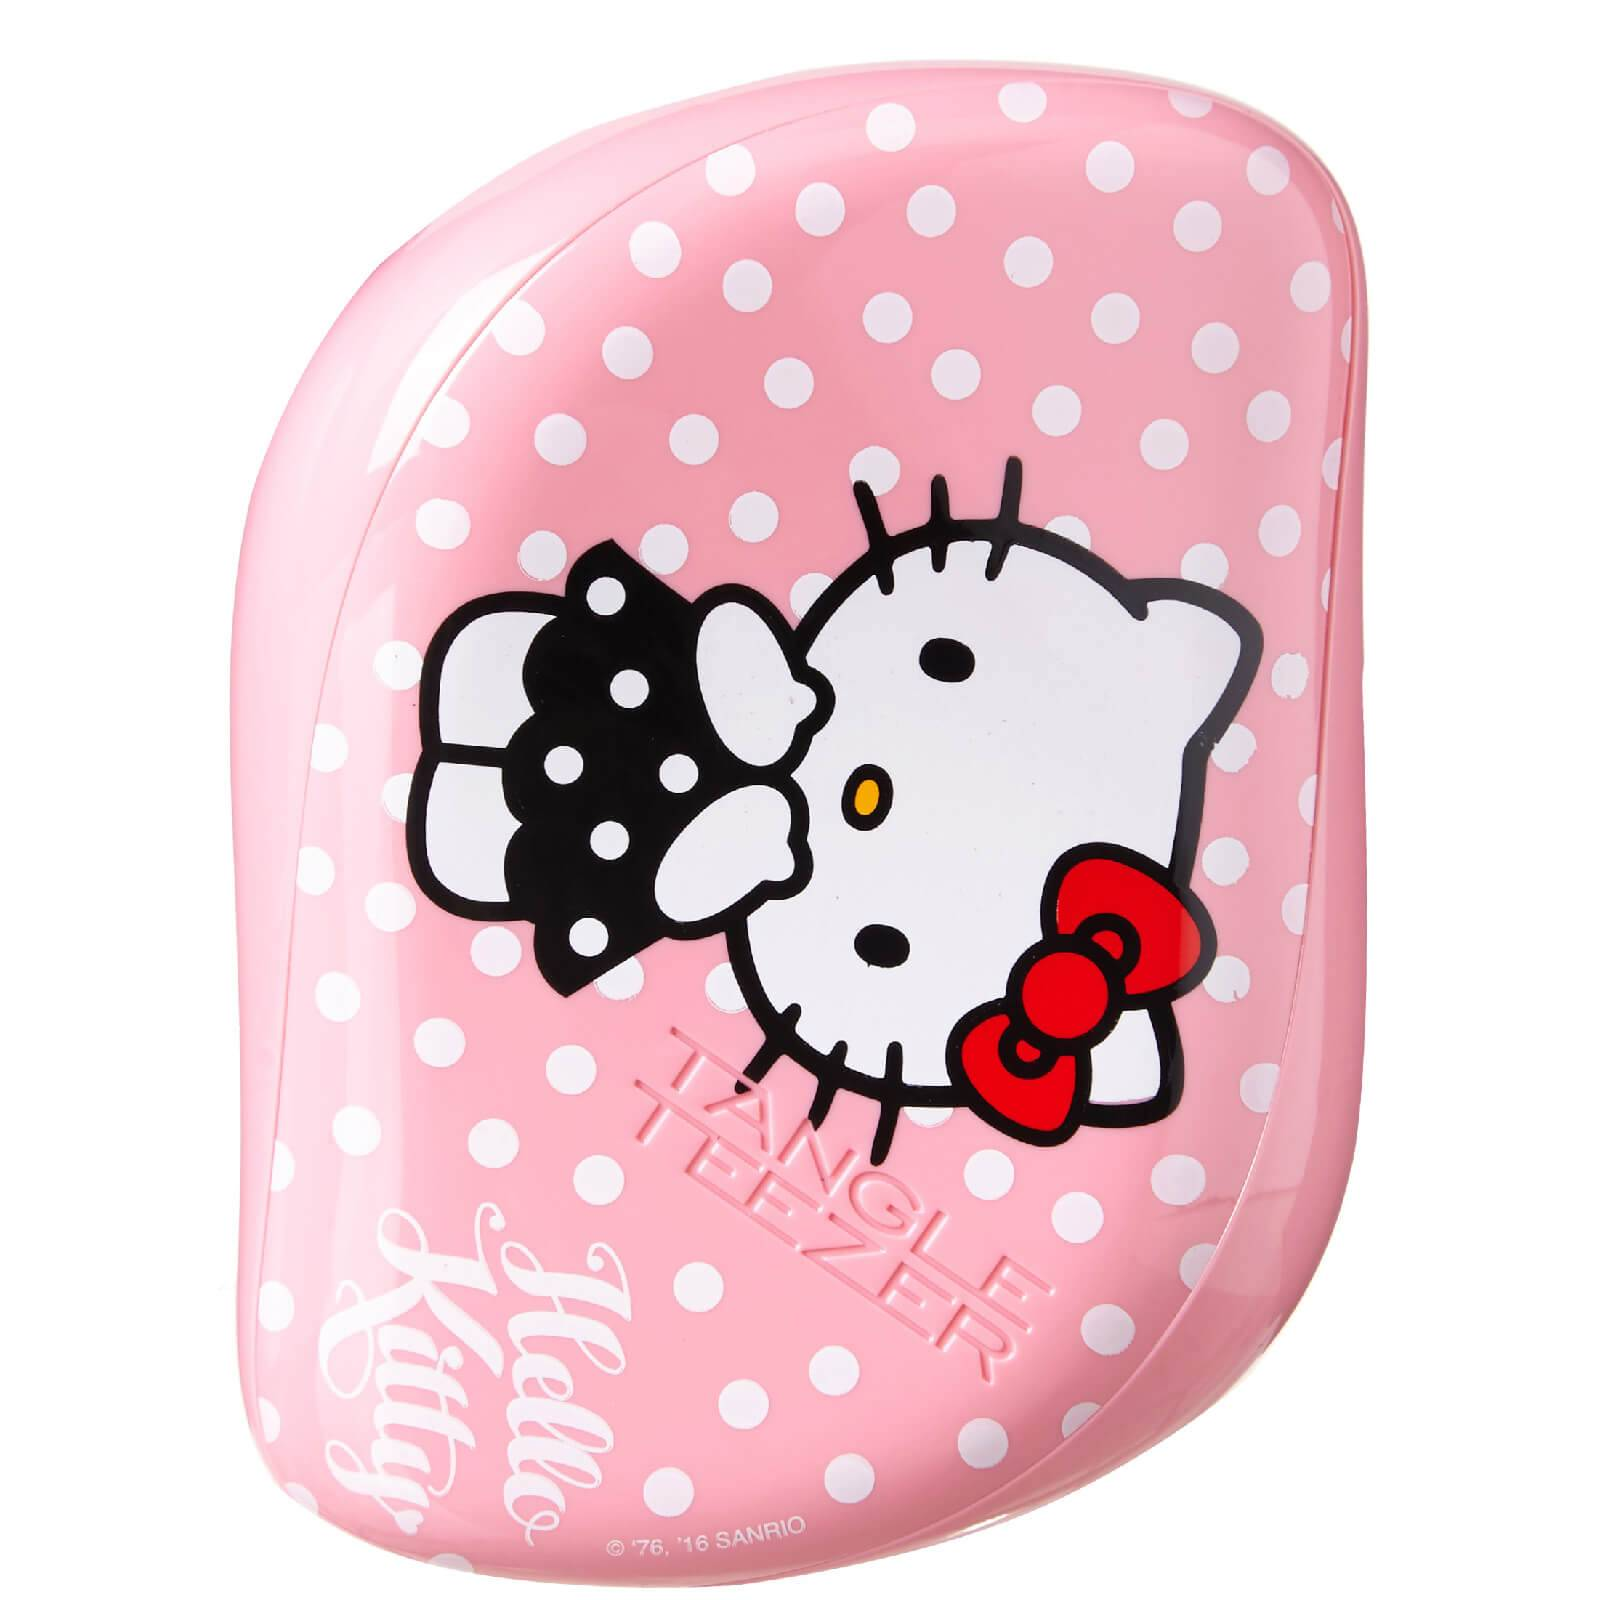 Tangle Teezer Brosse à cheveux compacte démêlante Hello Kitty - rose